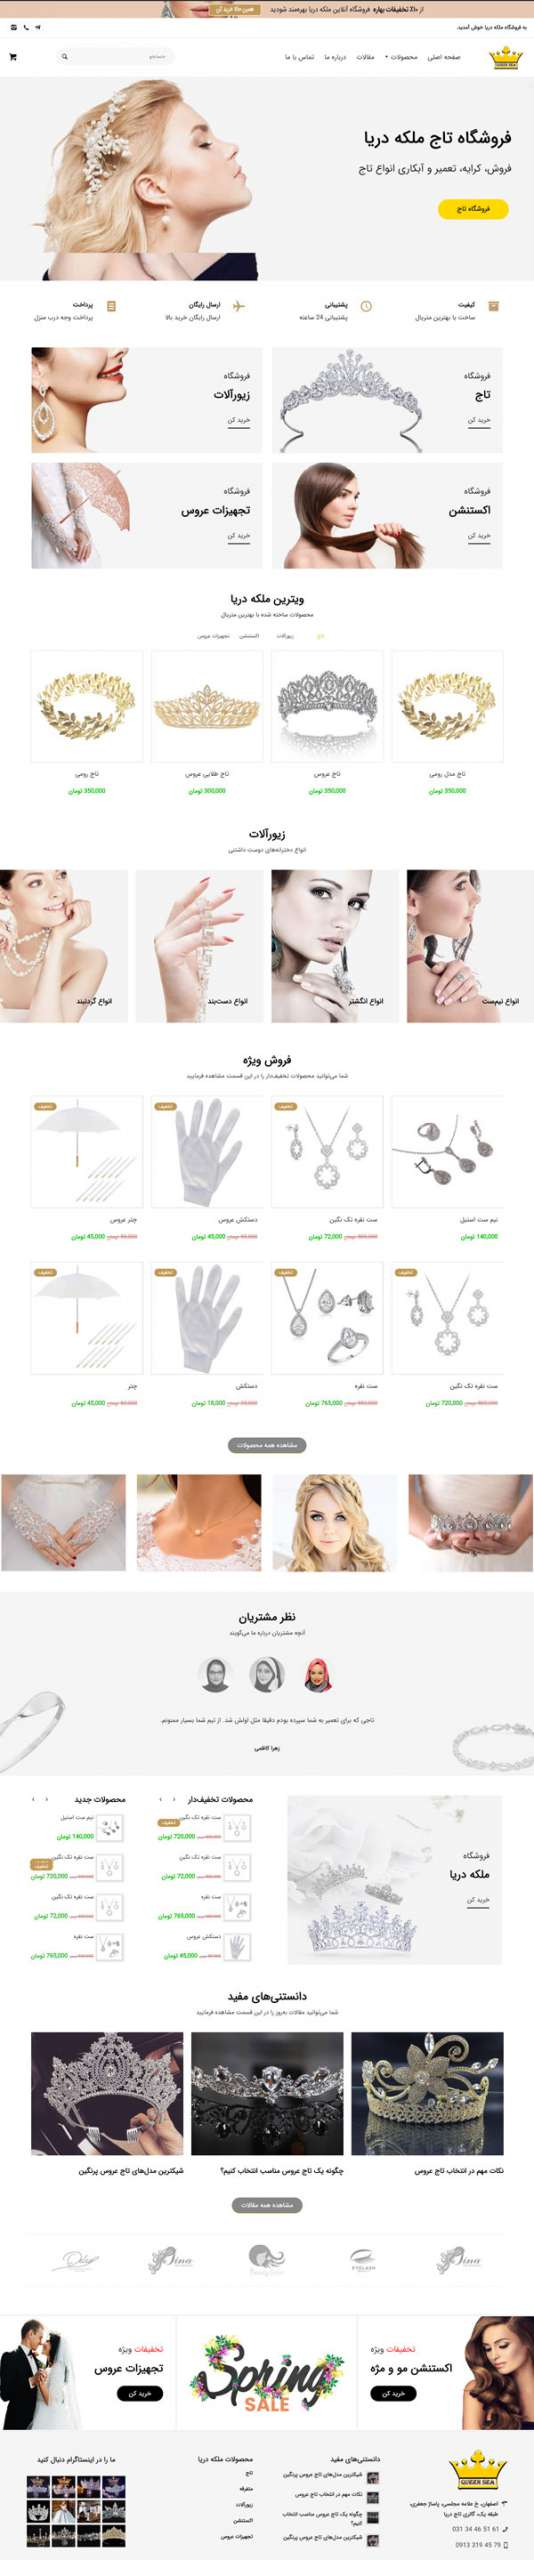 طراحی سایت ملکه دریا | اکسسوری عروس